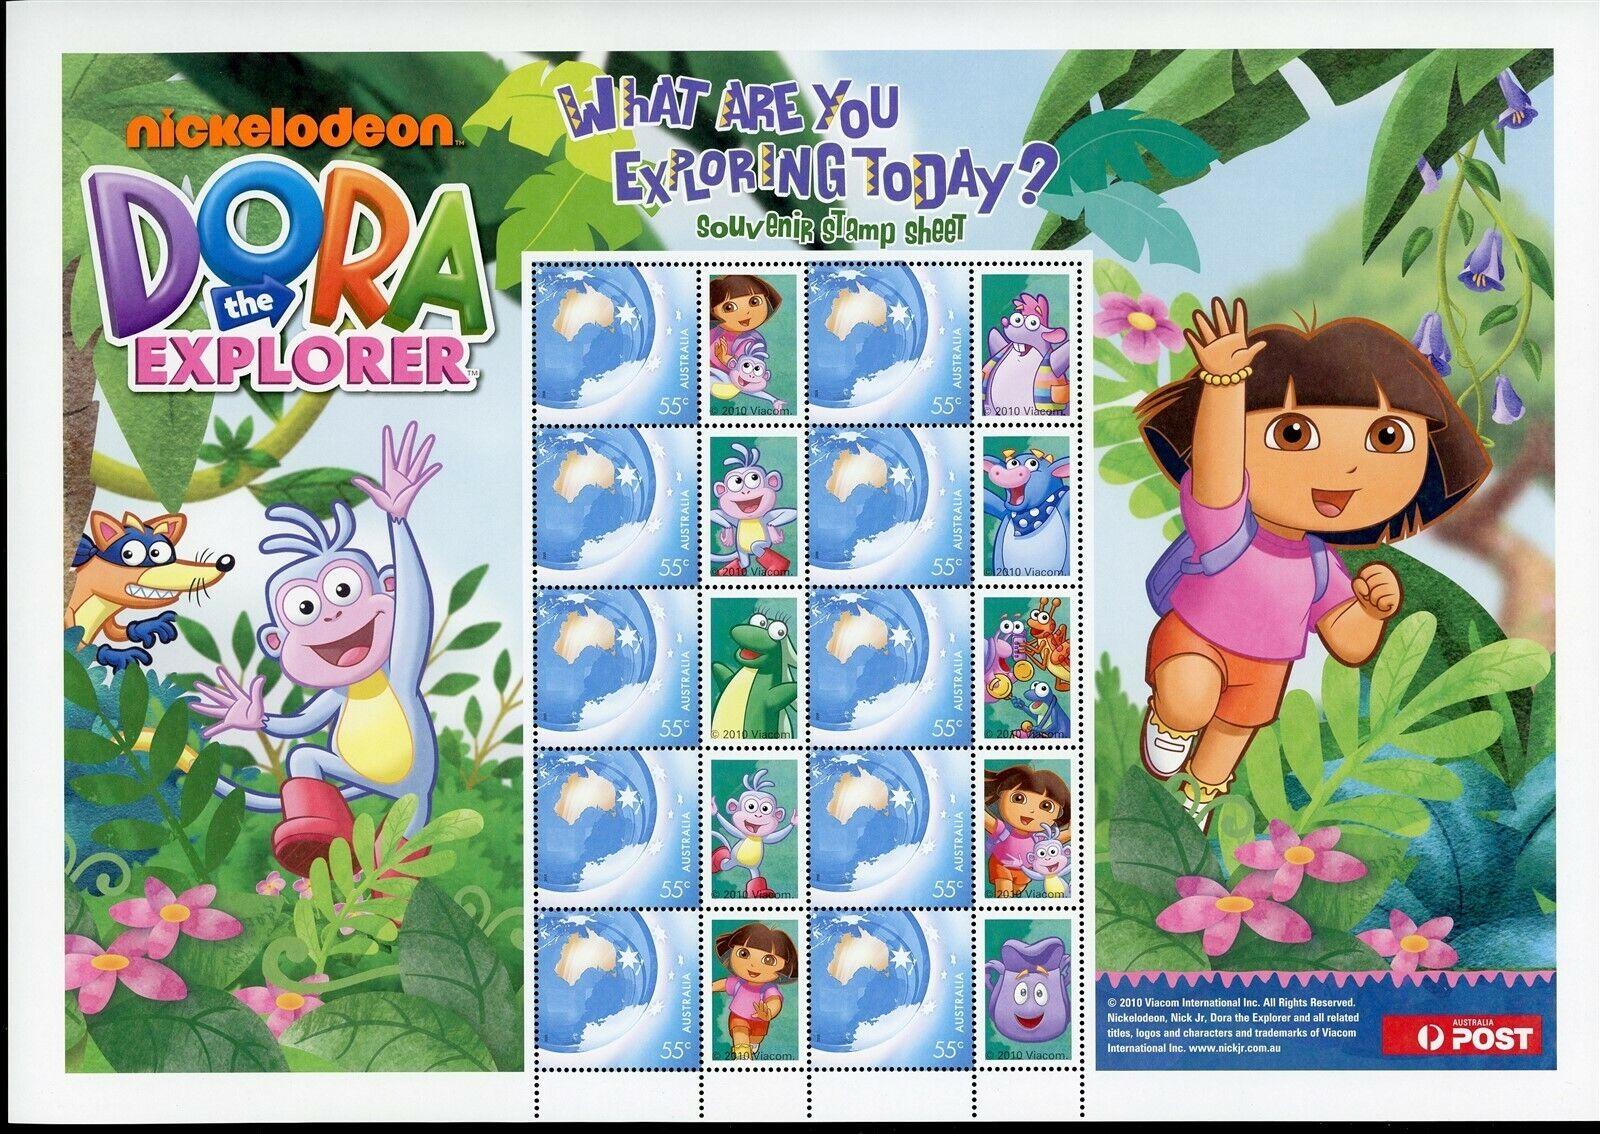 Australia Mnh Sheet Dora The Explorer Os 91